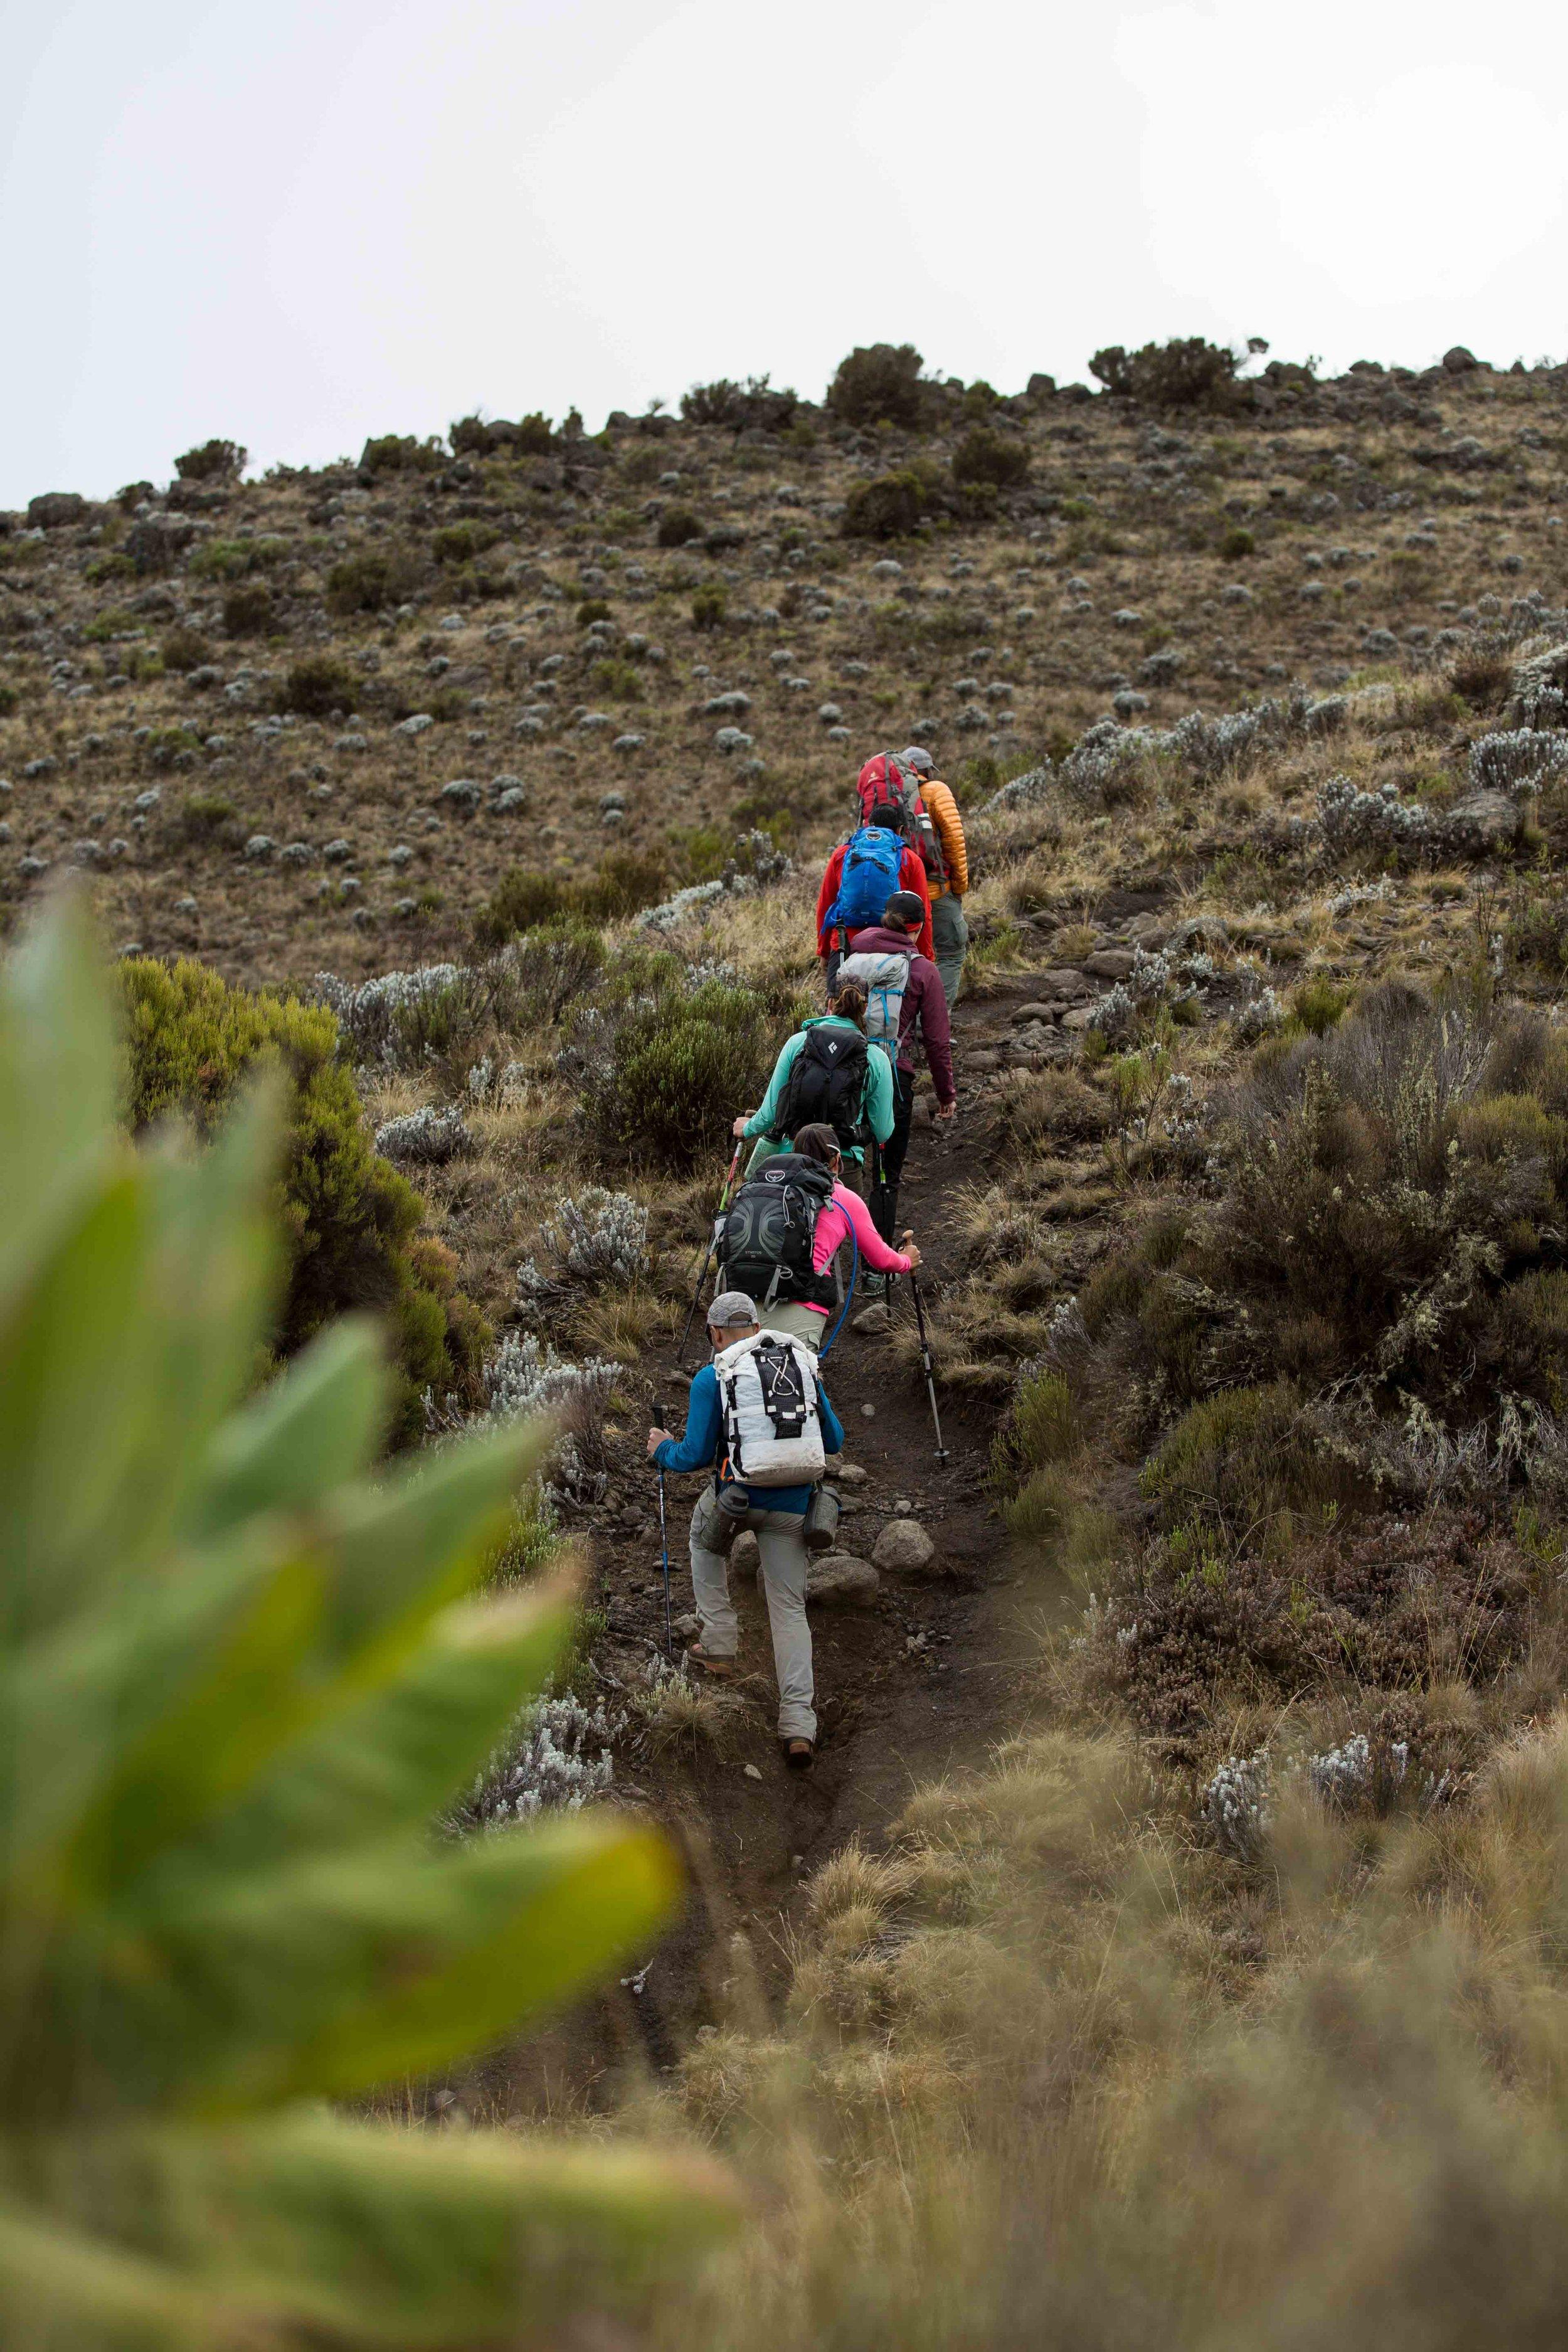 ajw_REI_Kilimanjaro-23.jpg